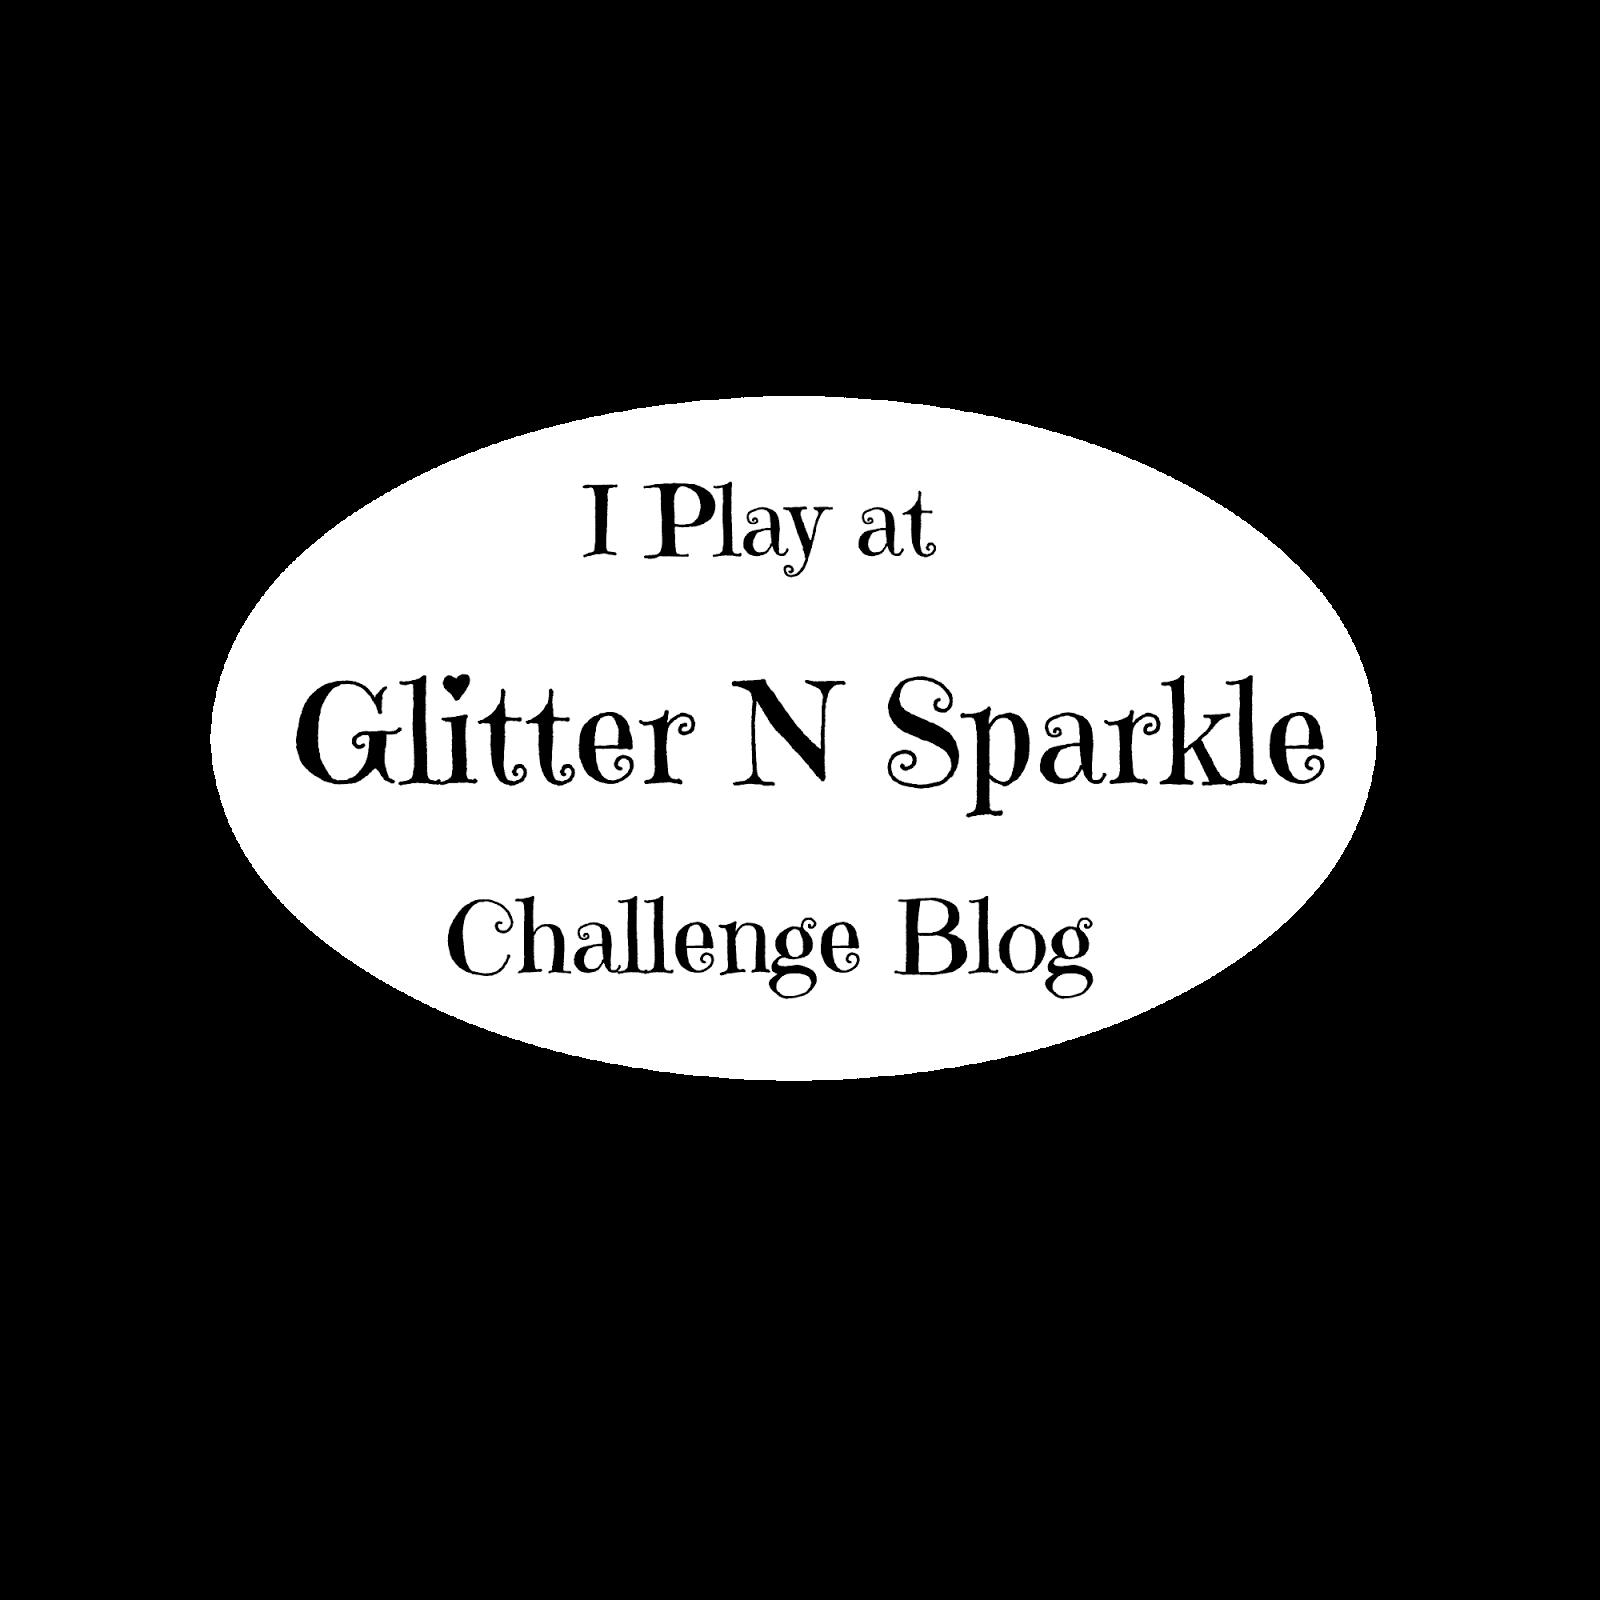 Glitter 'N' Sparkle